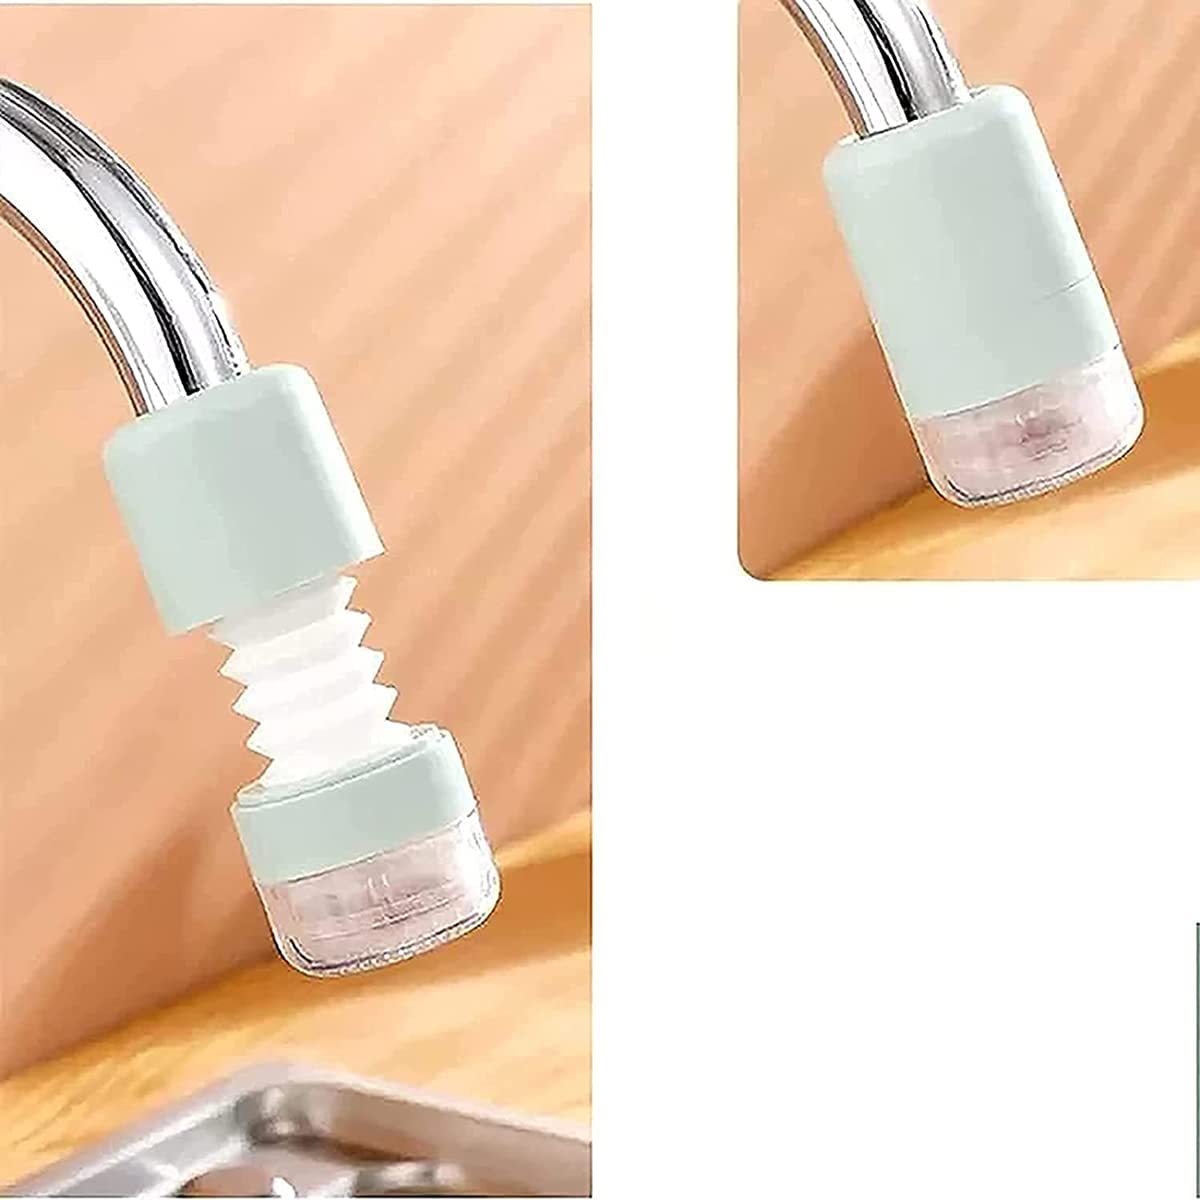 KJGFES 4PCS 360-degree Adjustable faucets Bombing new work Milwaukee Mall Extensio Splash-Proof